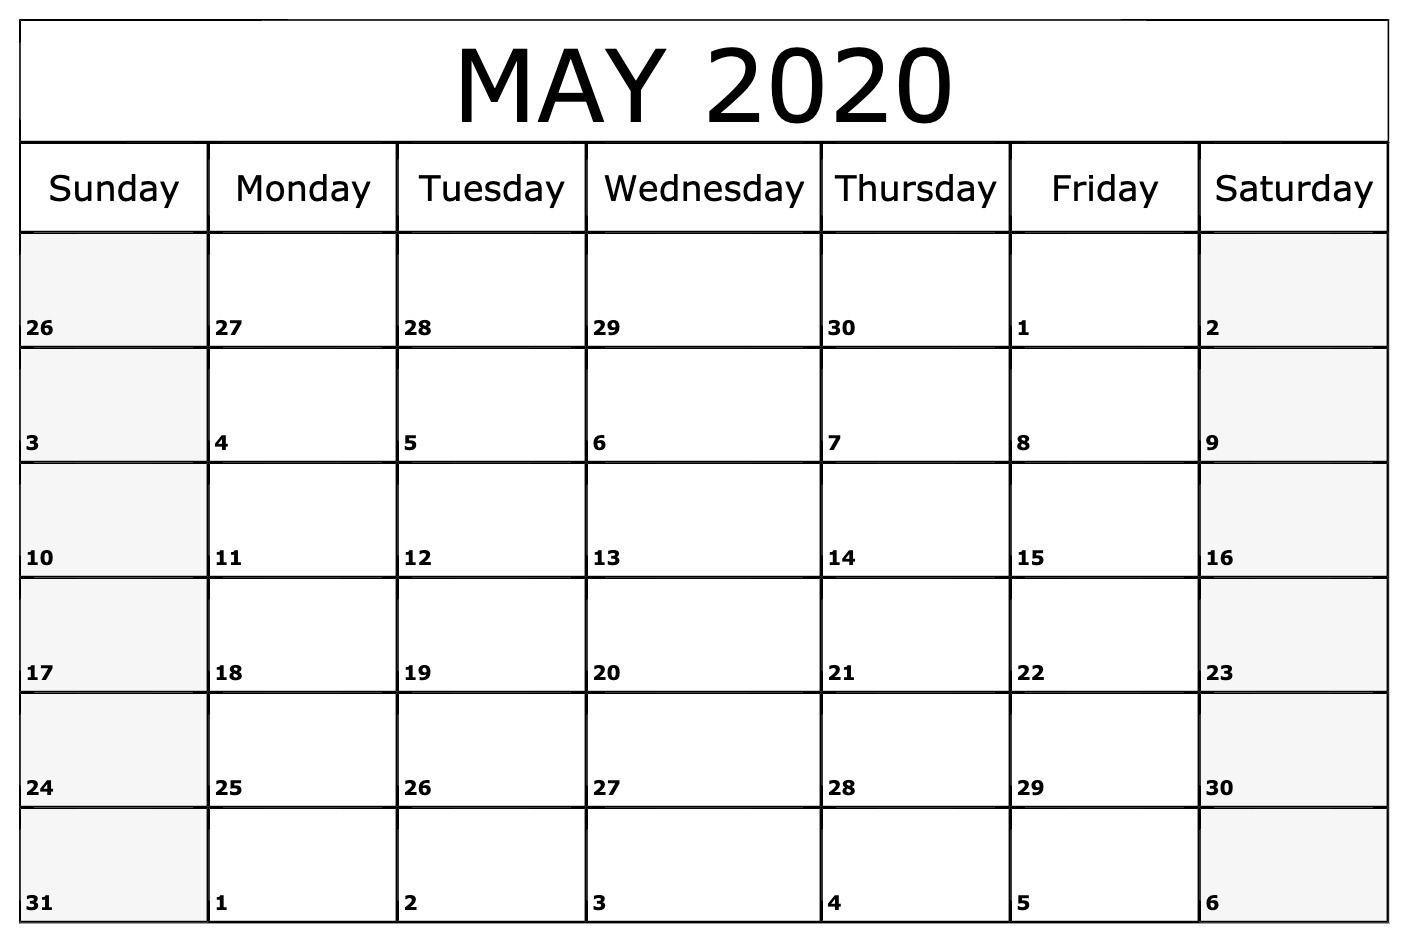 Free Cute May 2020 Calendar Template | Printable Calendar Within Sunrise Sunset Calendar Printable